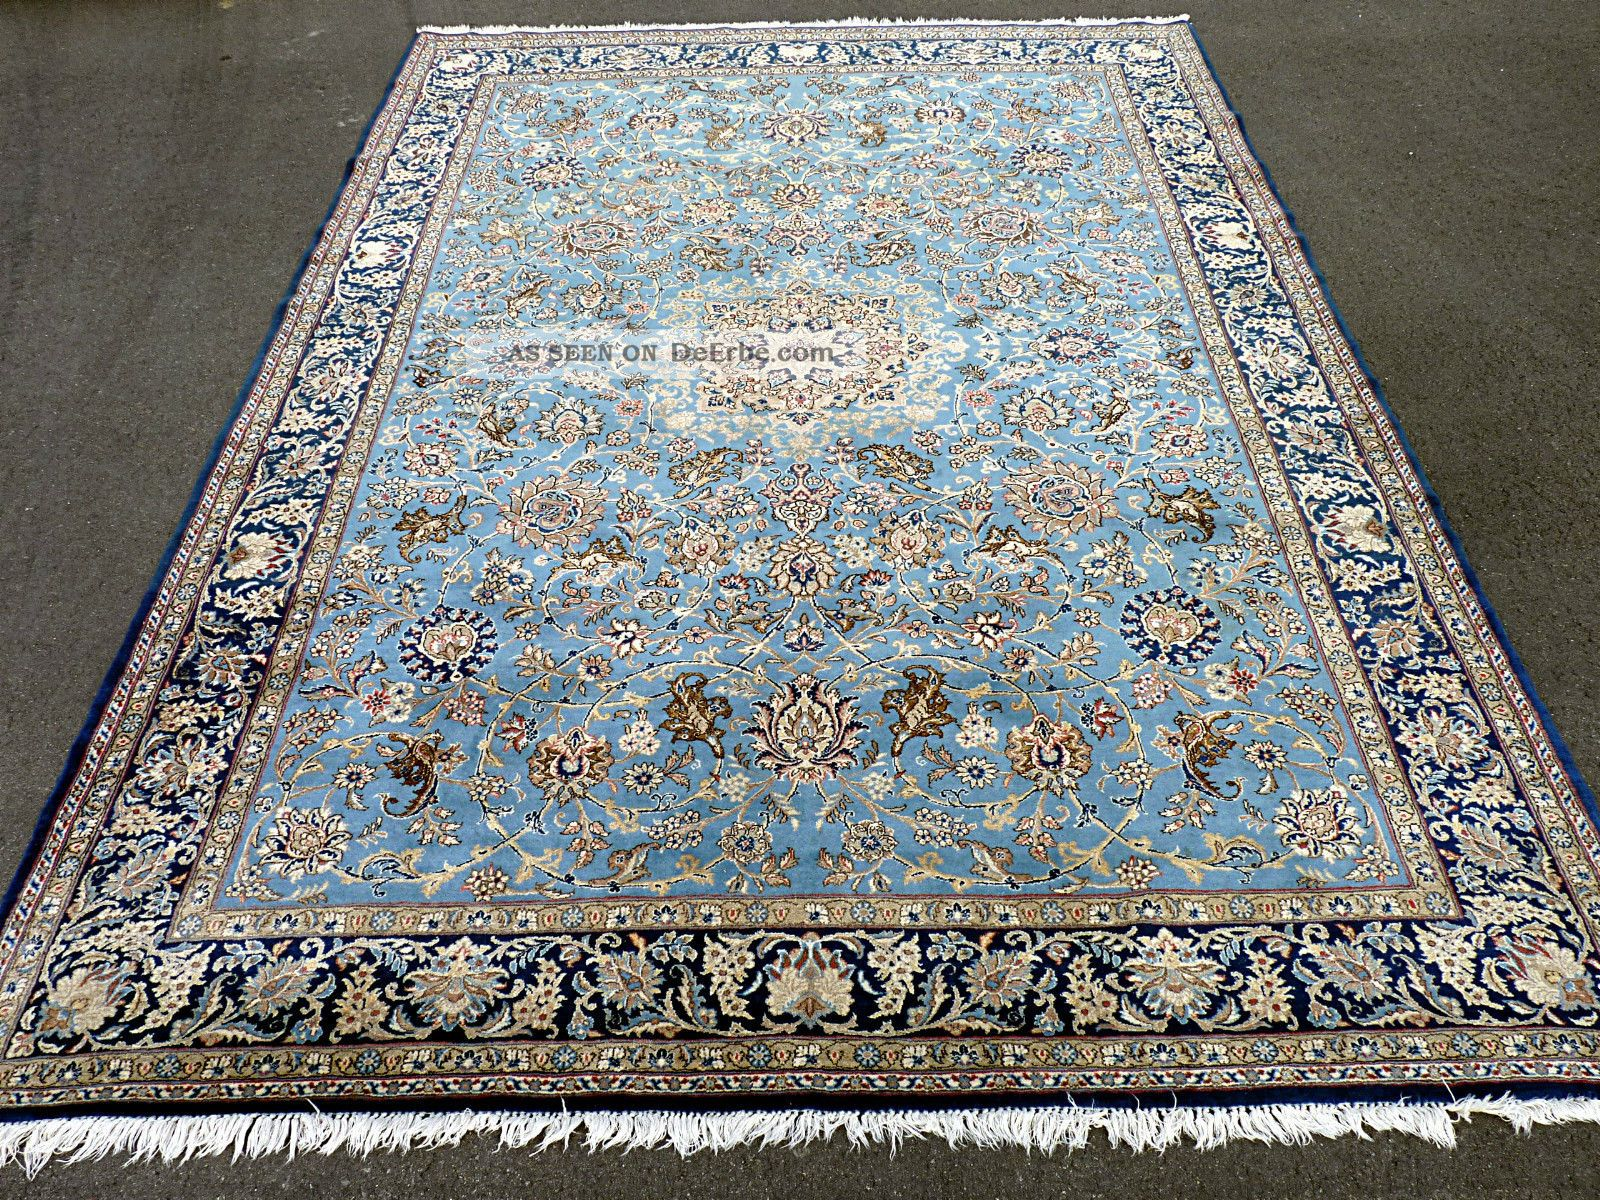 orient teppich perserteppich oriental rug tapis persan ca 350x350 11 5 39 x8 2. Black Bedroom Furniture Sets. Home Design Ideas